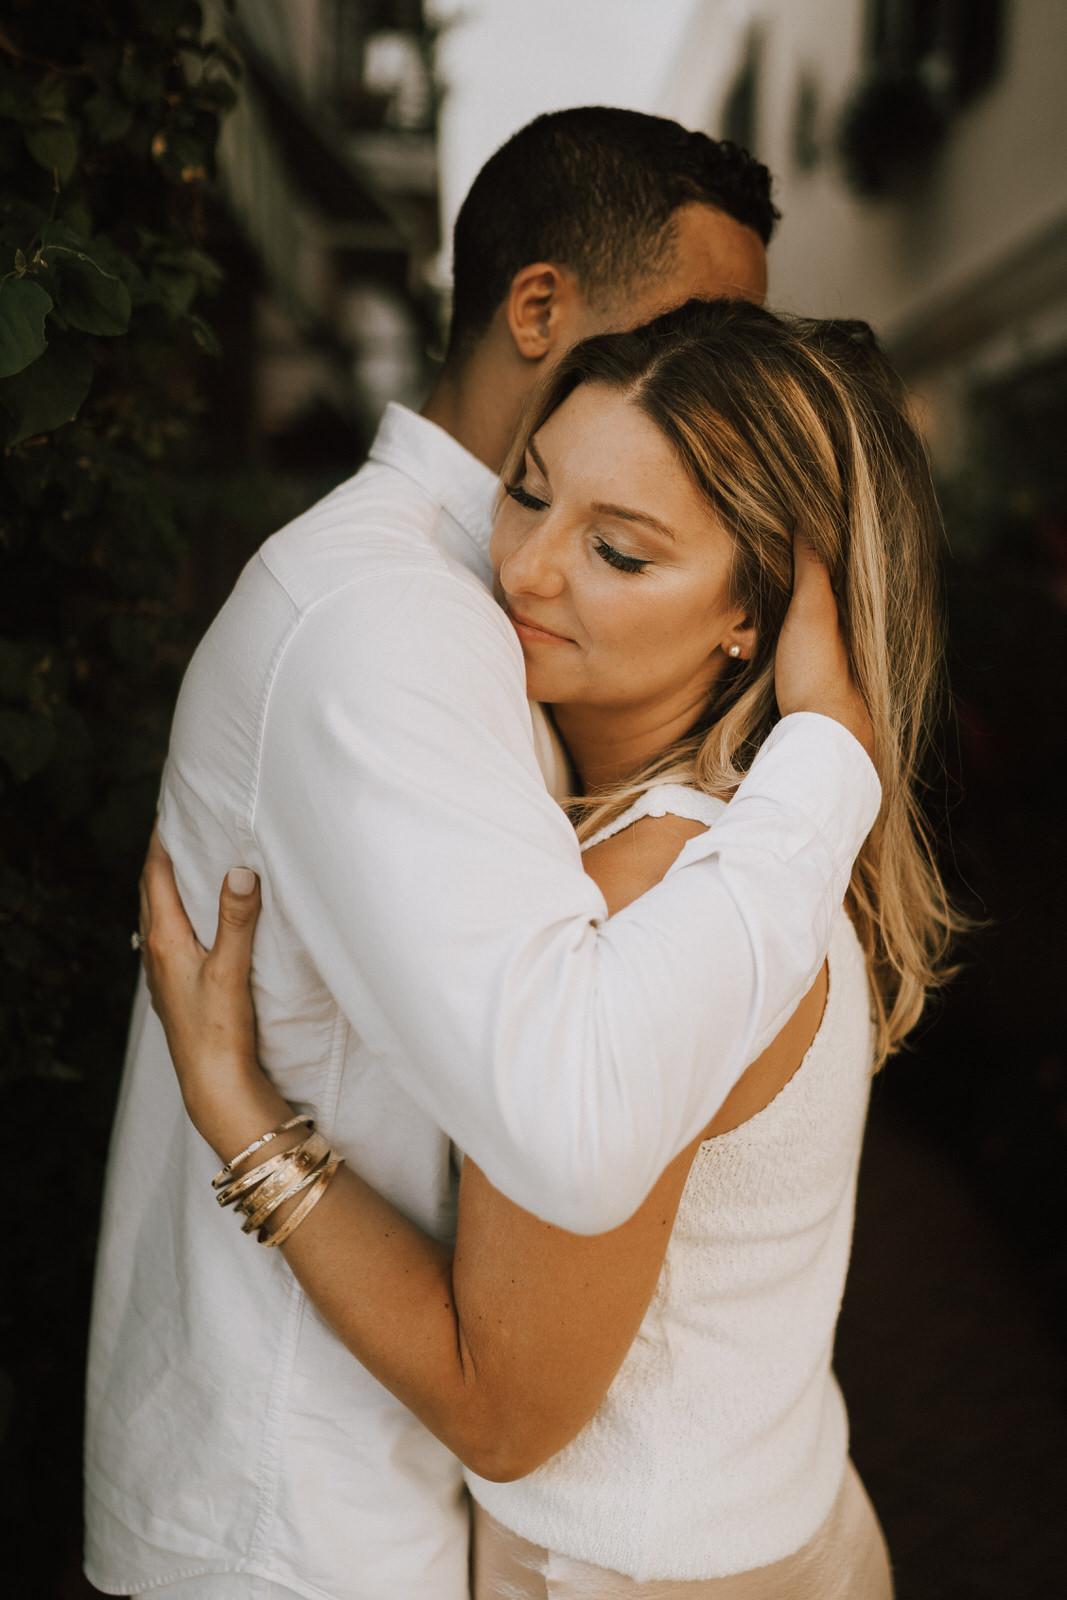 Naples 5th Ave Engagement Photos- Michelle Gonzalez Photography- Michele + Troy-159.JPG